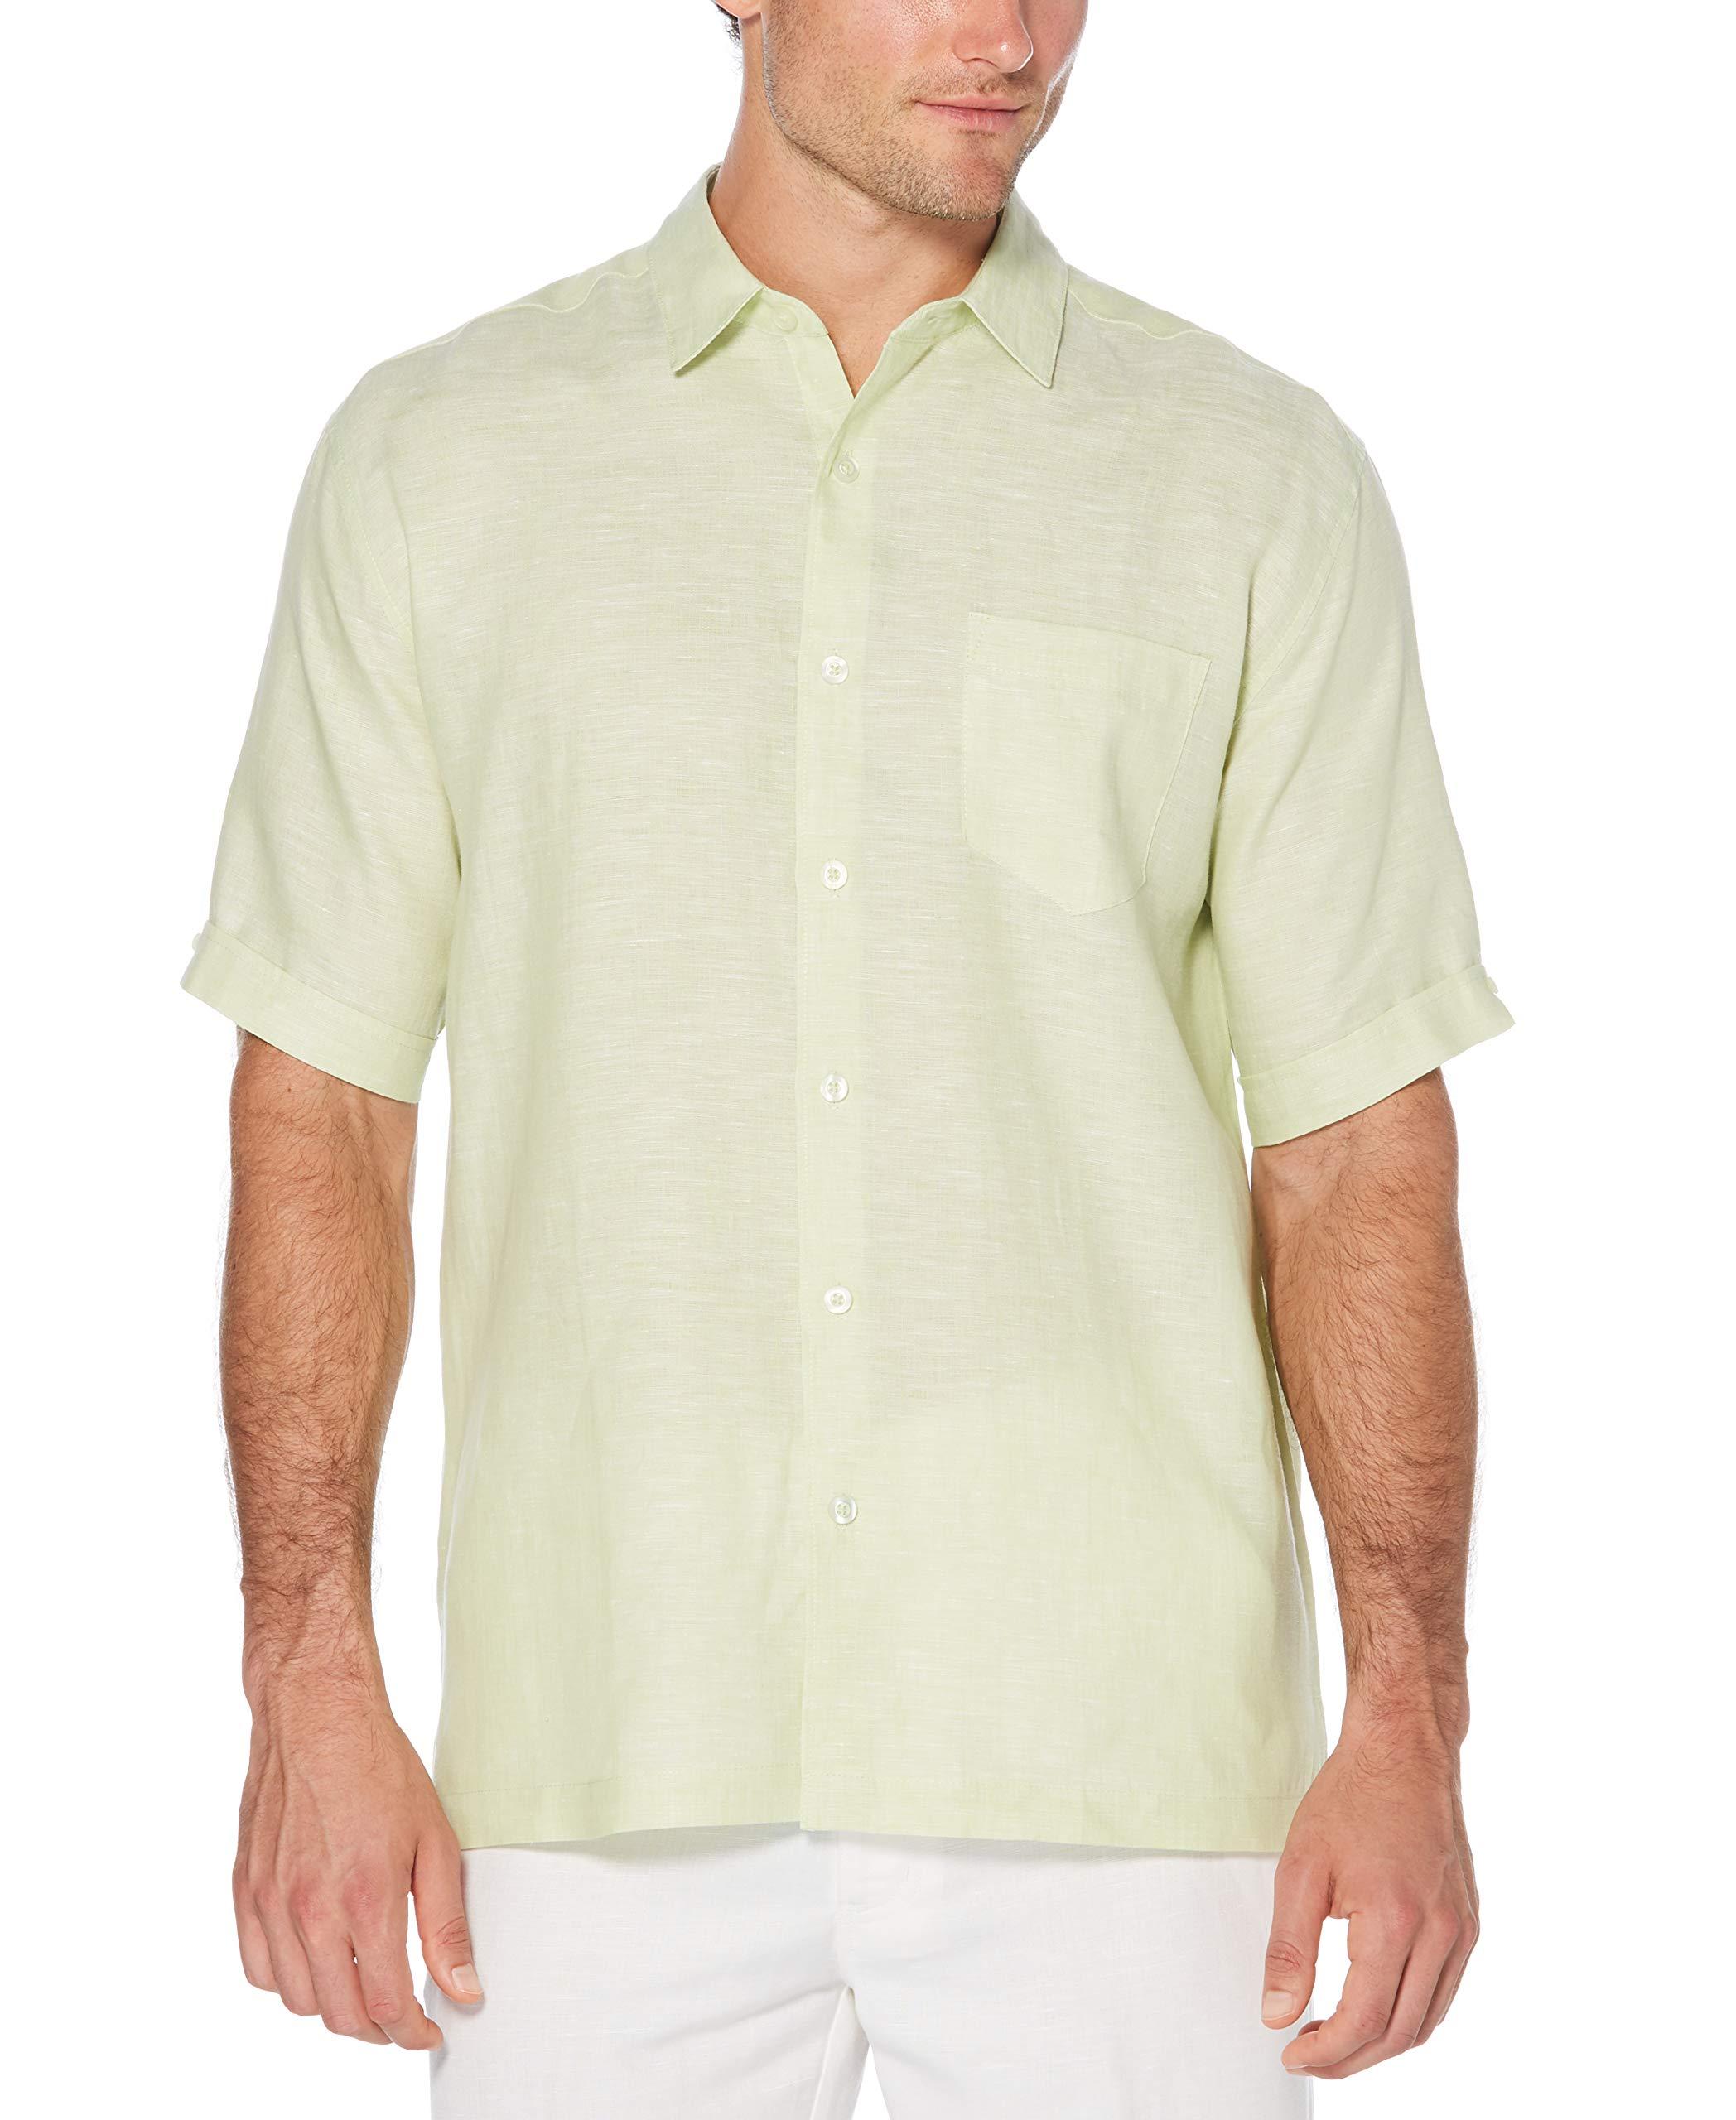 Cubavera Men's Big and Tall Short Sleeve 100% Linen Cross-Dyed Button-Down Shirt with Pocket